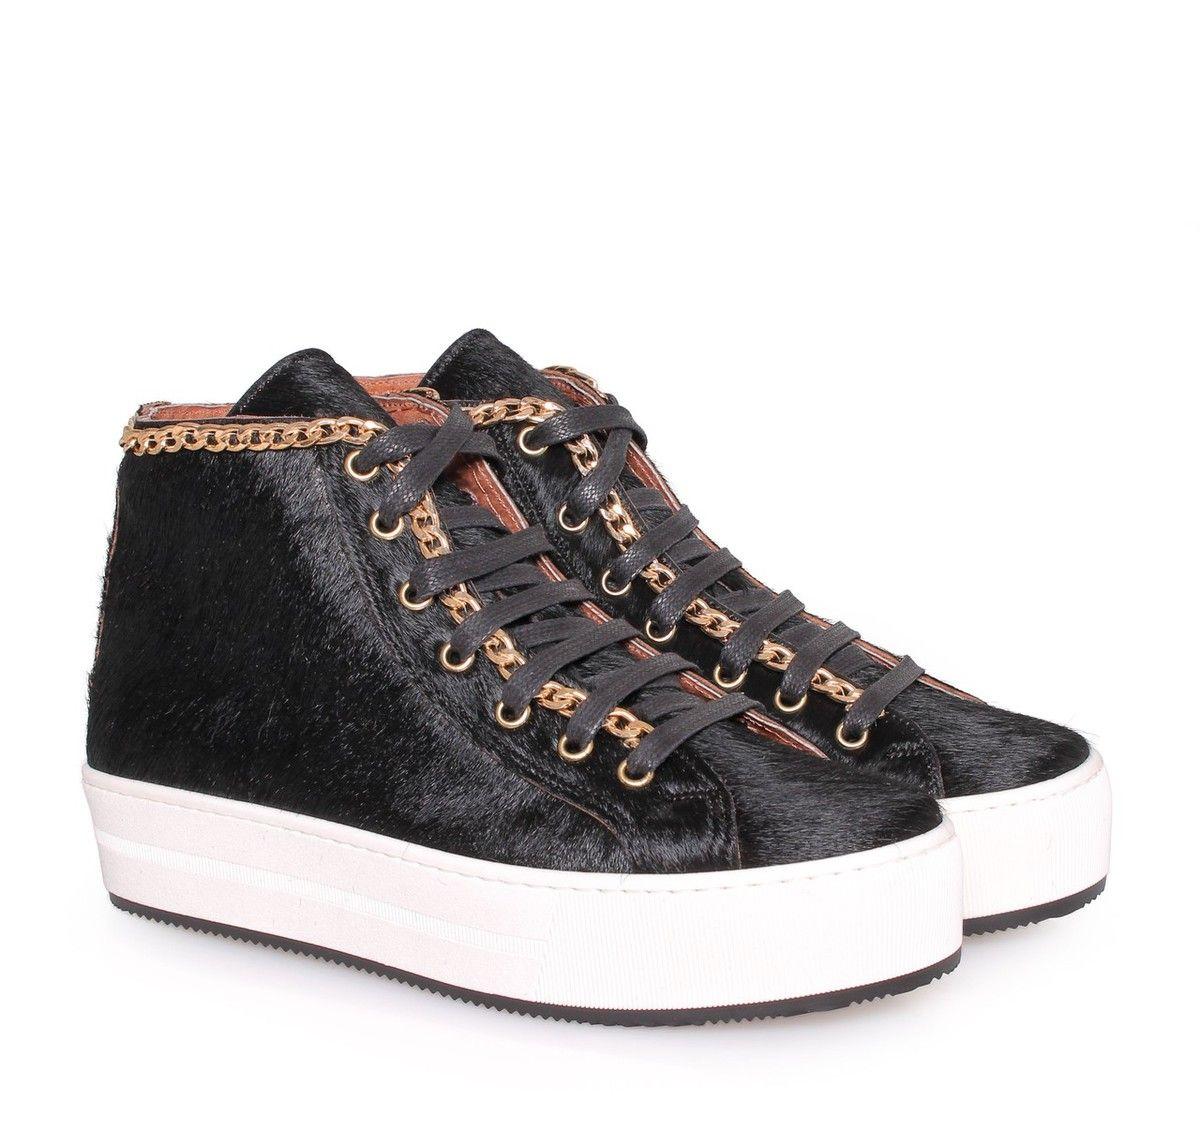 EXE γυναικεία παπούτσια τύπου oxfords σε μπλε 85d6bfd30fb